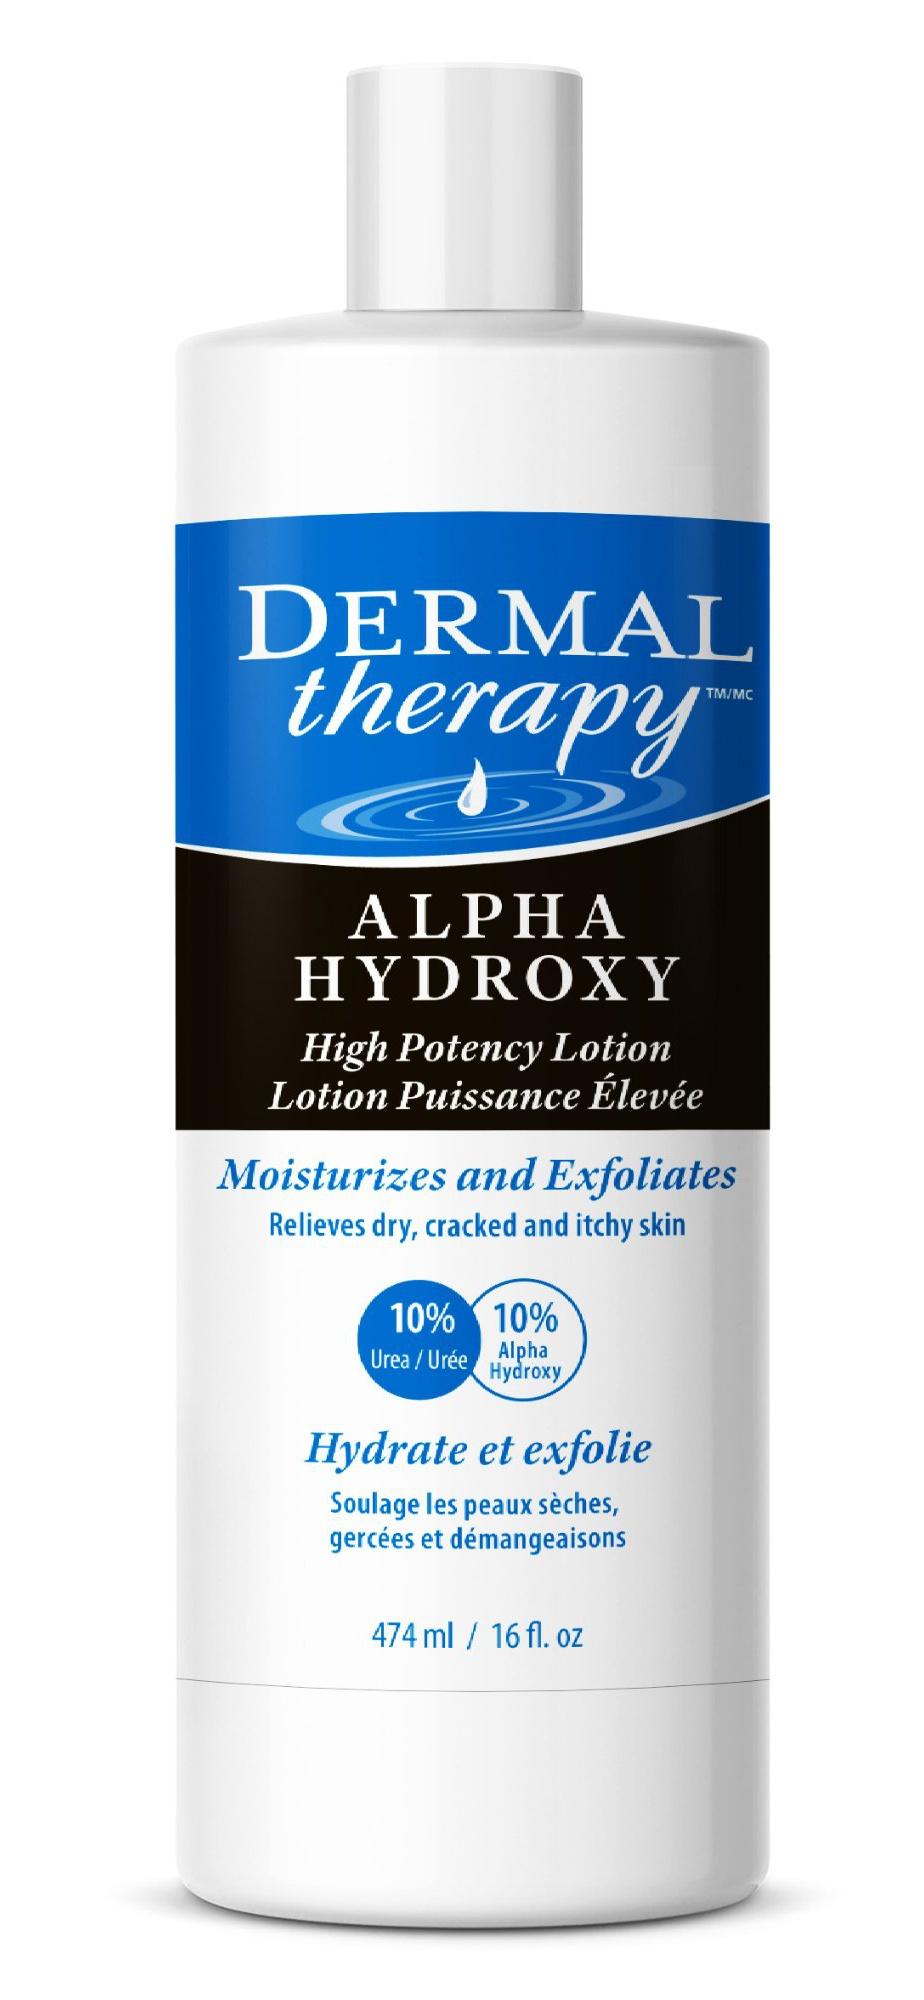 Dermal Therapy Alpha Hydroxy Lotion